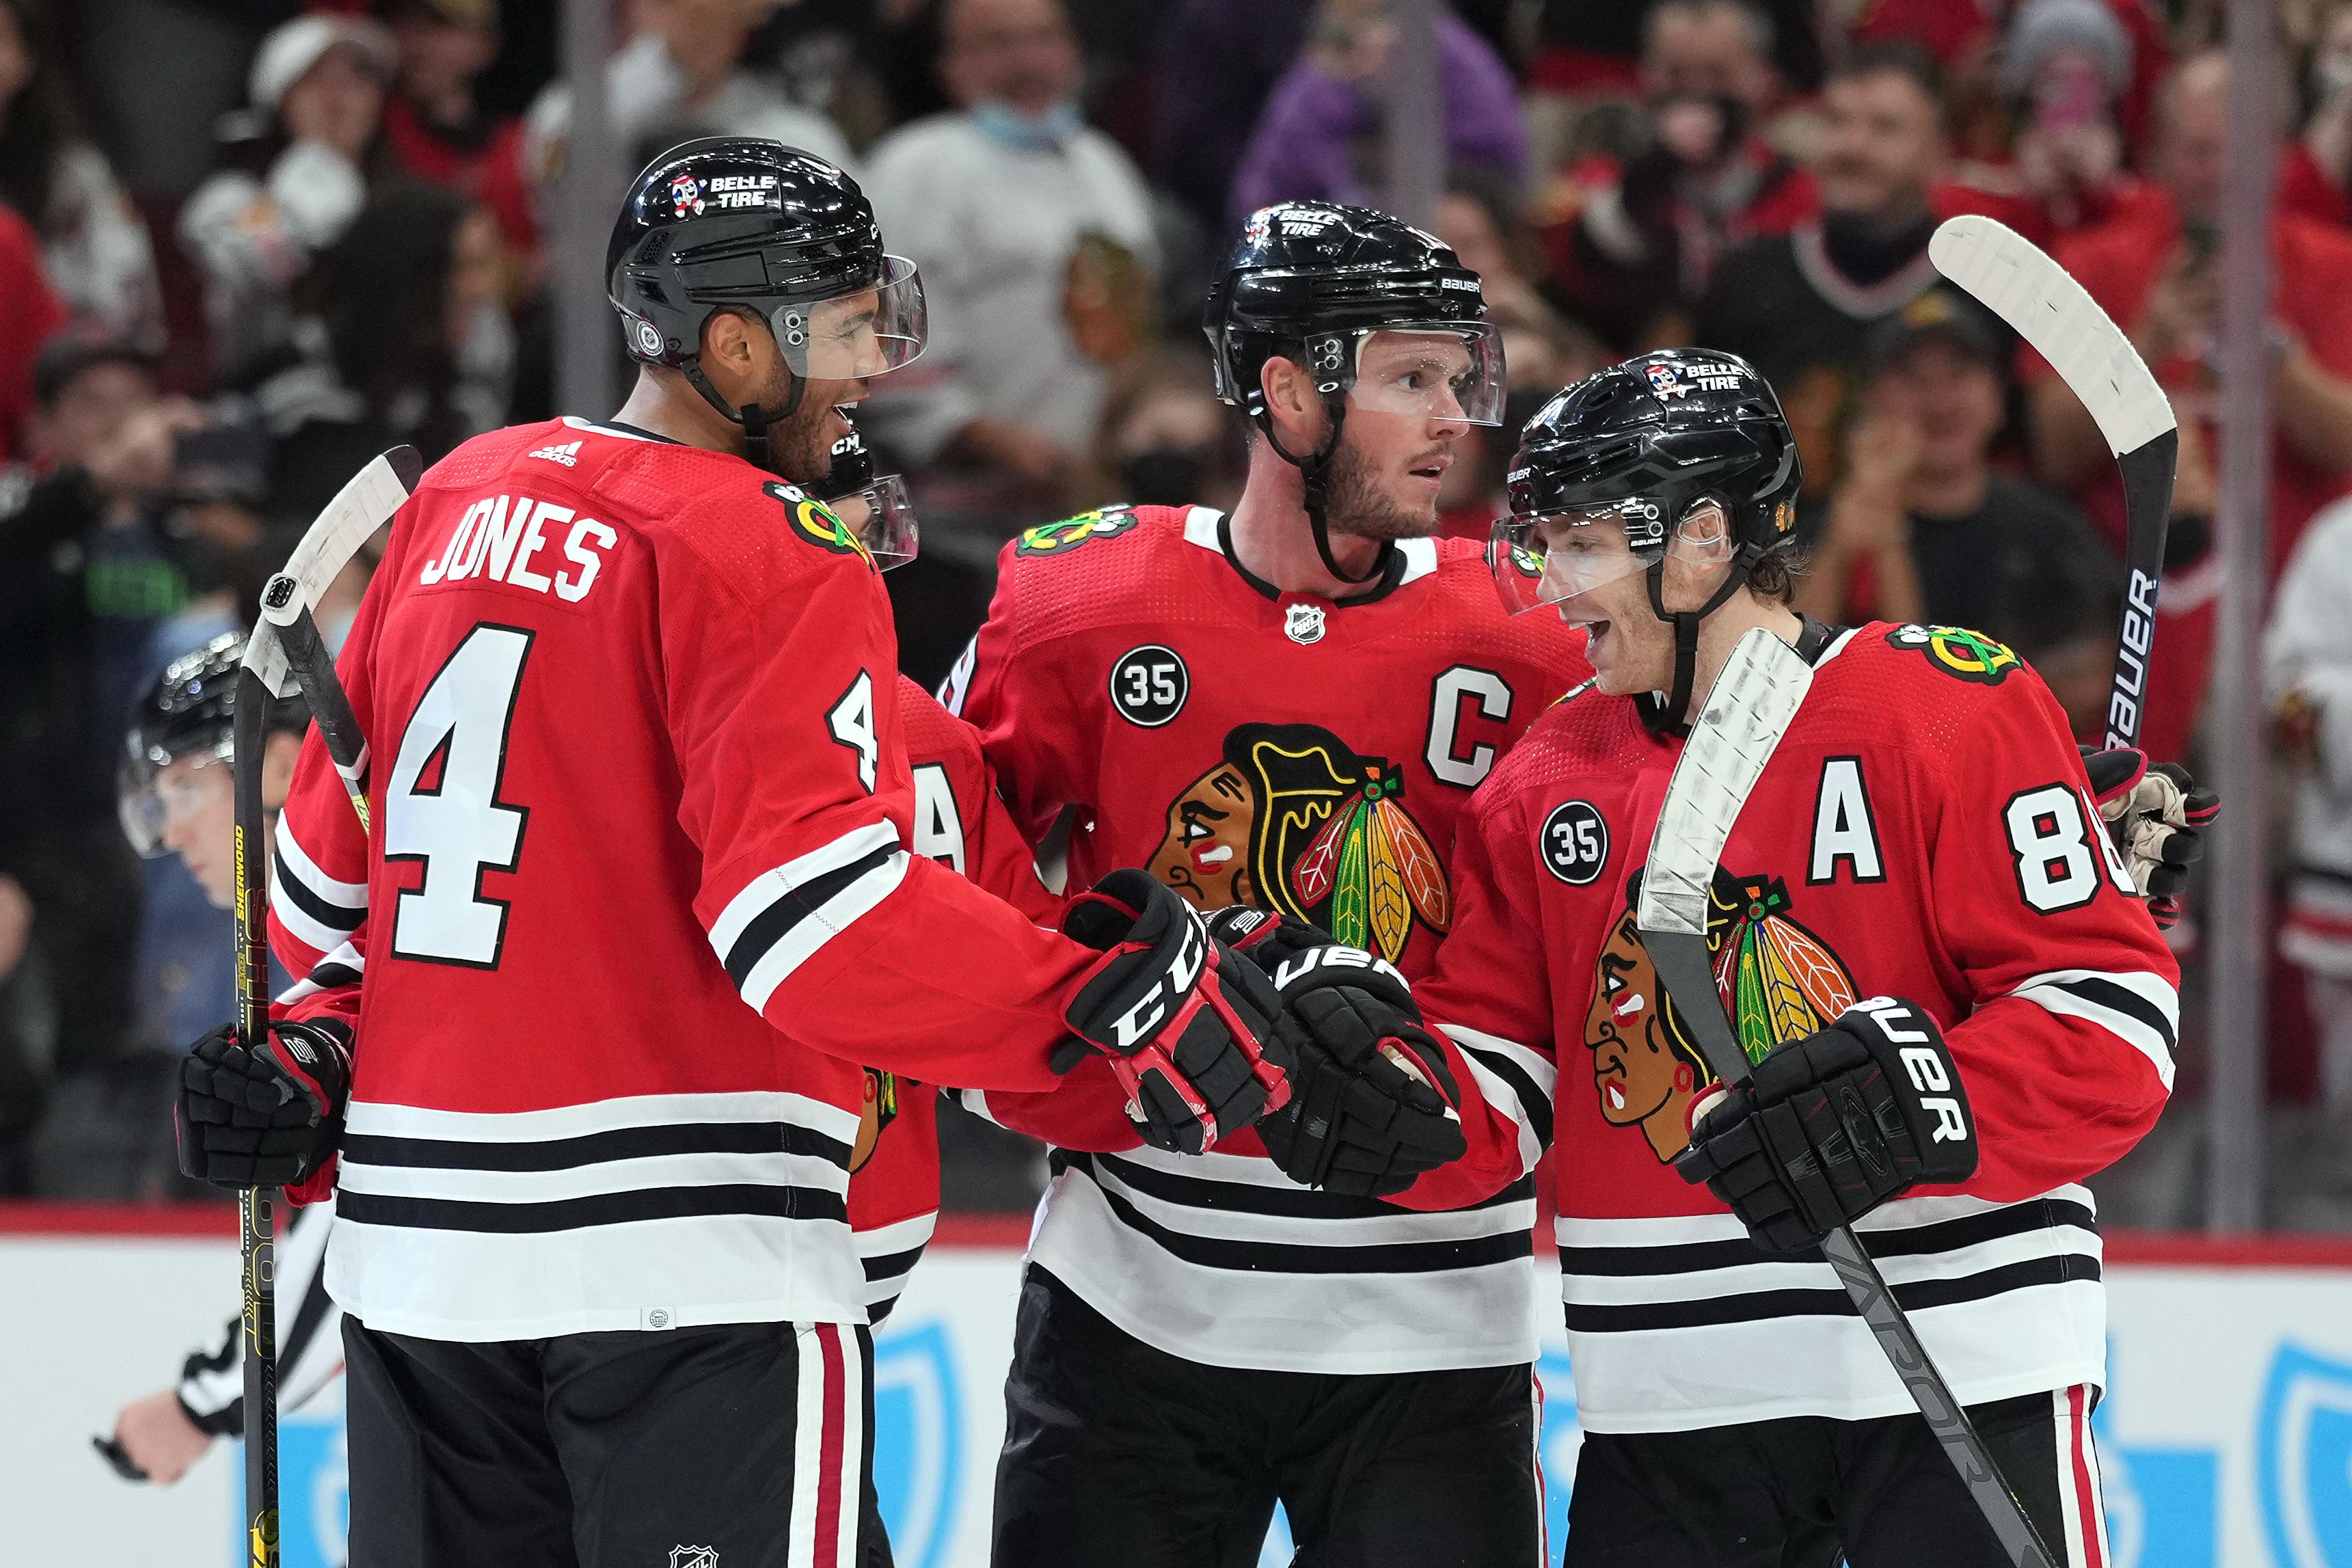 NHL: OCT 09 Preseason - Wild at Blackhawks